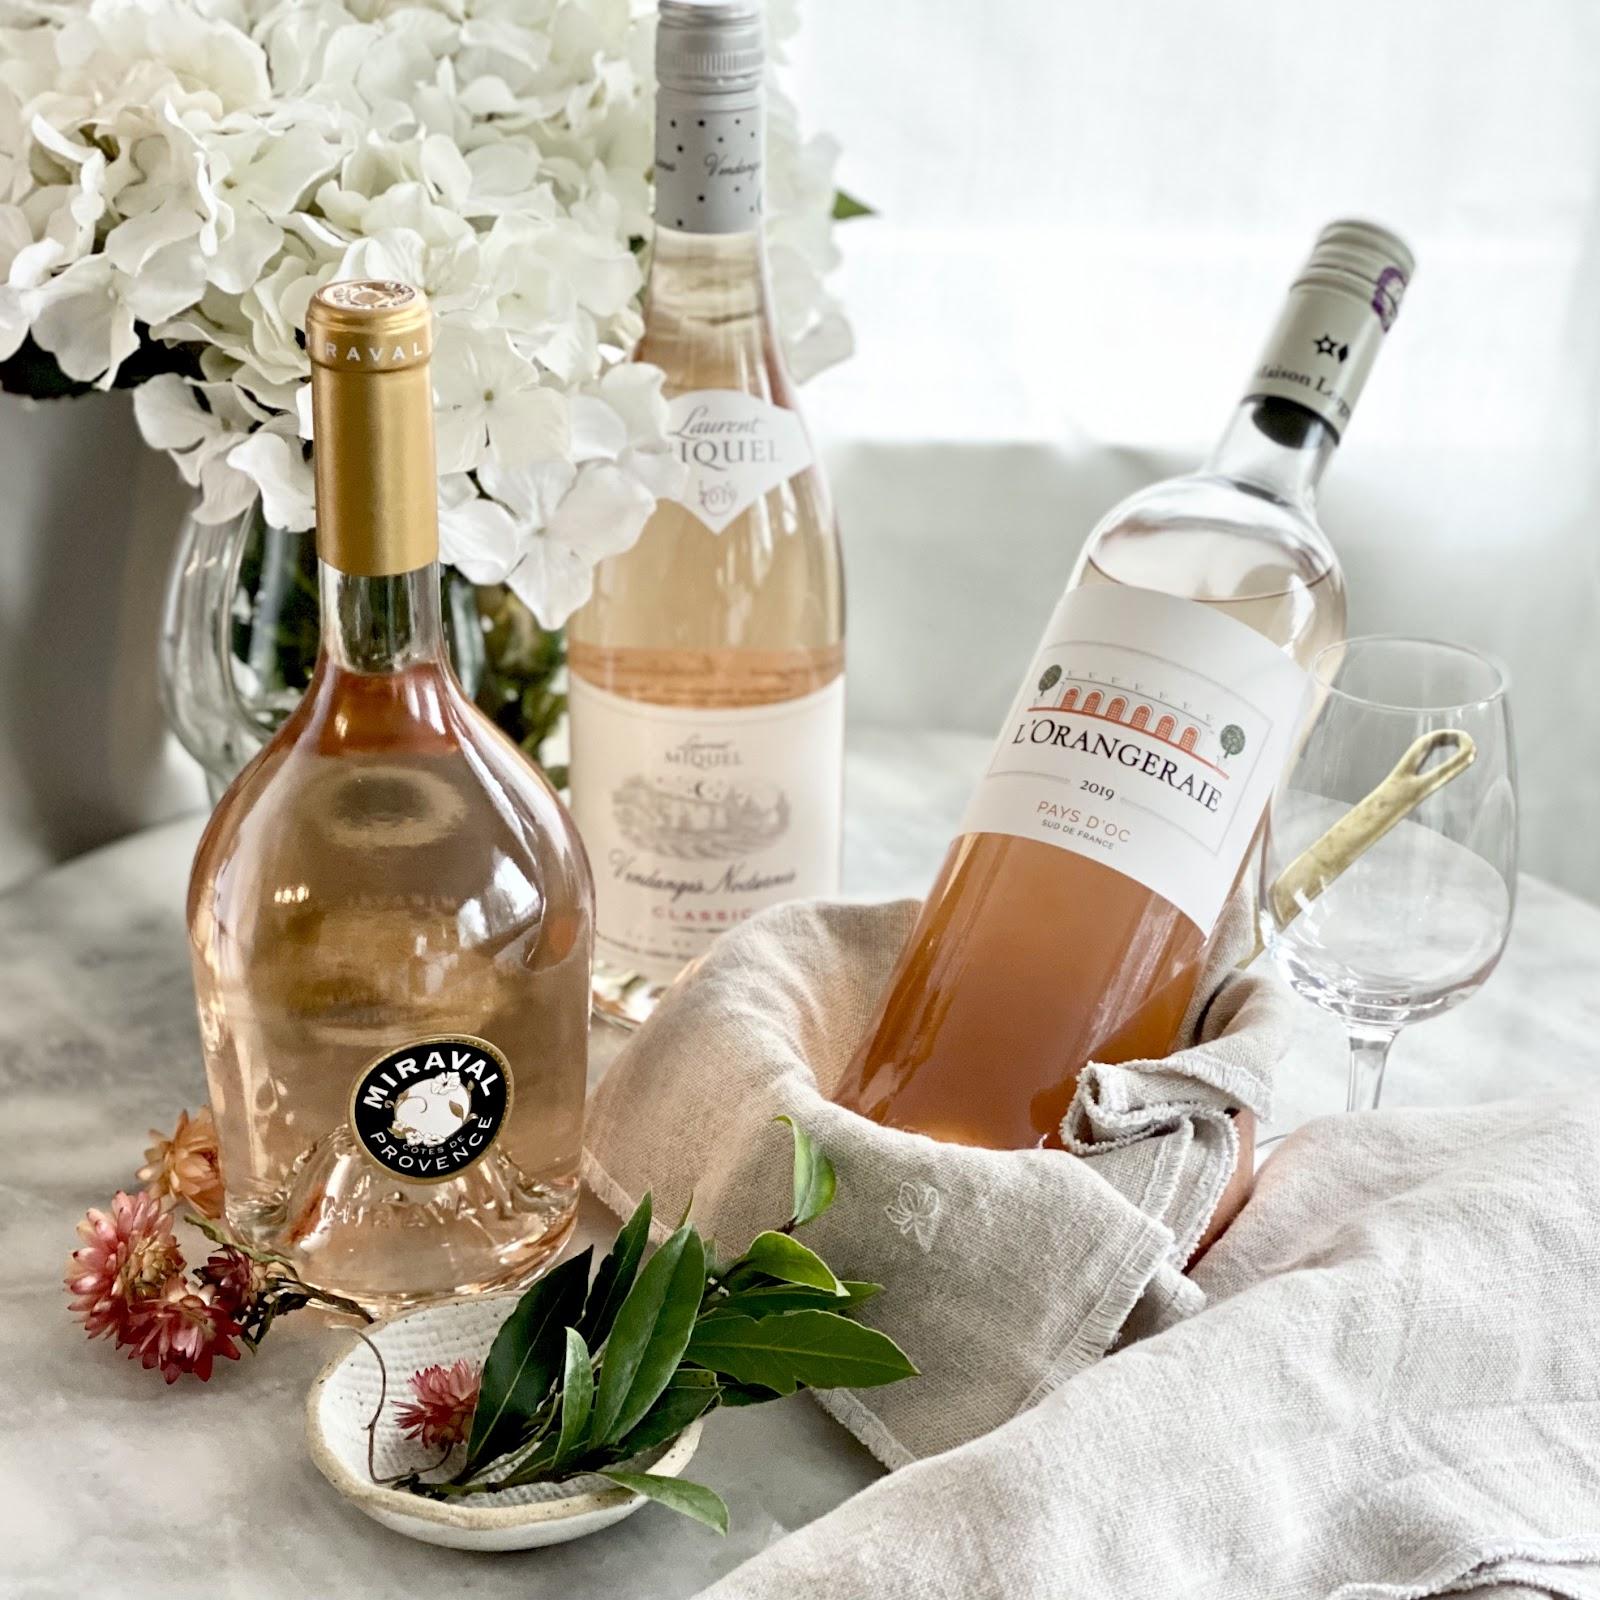 the home kitchen alison kent good wine gal barb wild 5 week series full wine photo shot tasting rose wines rose all may miraval l'orangeraie